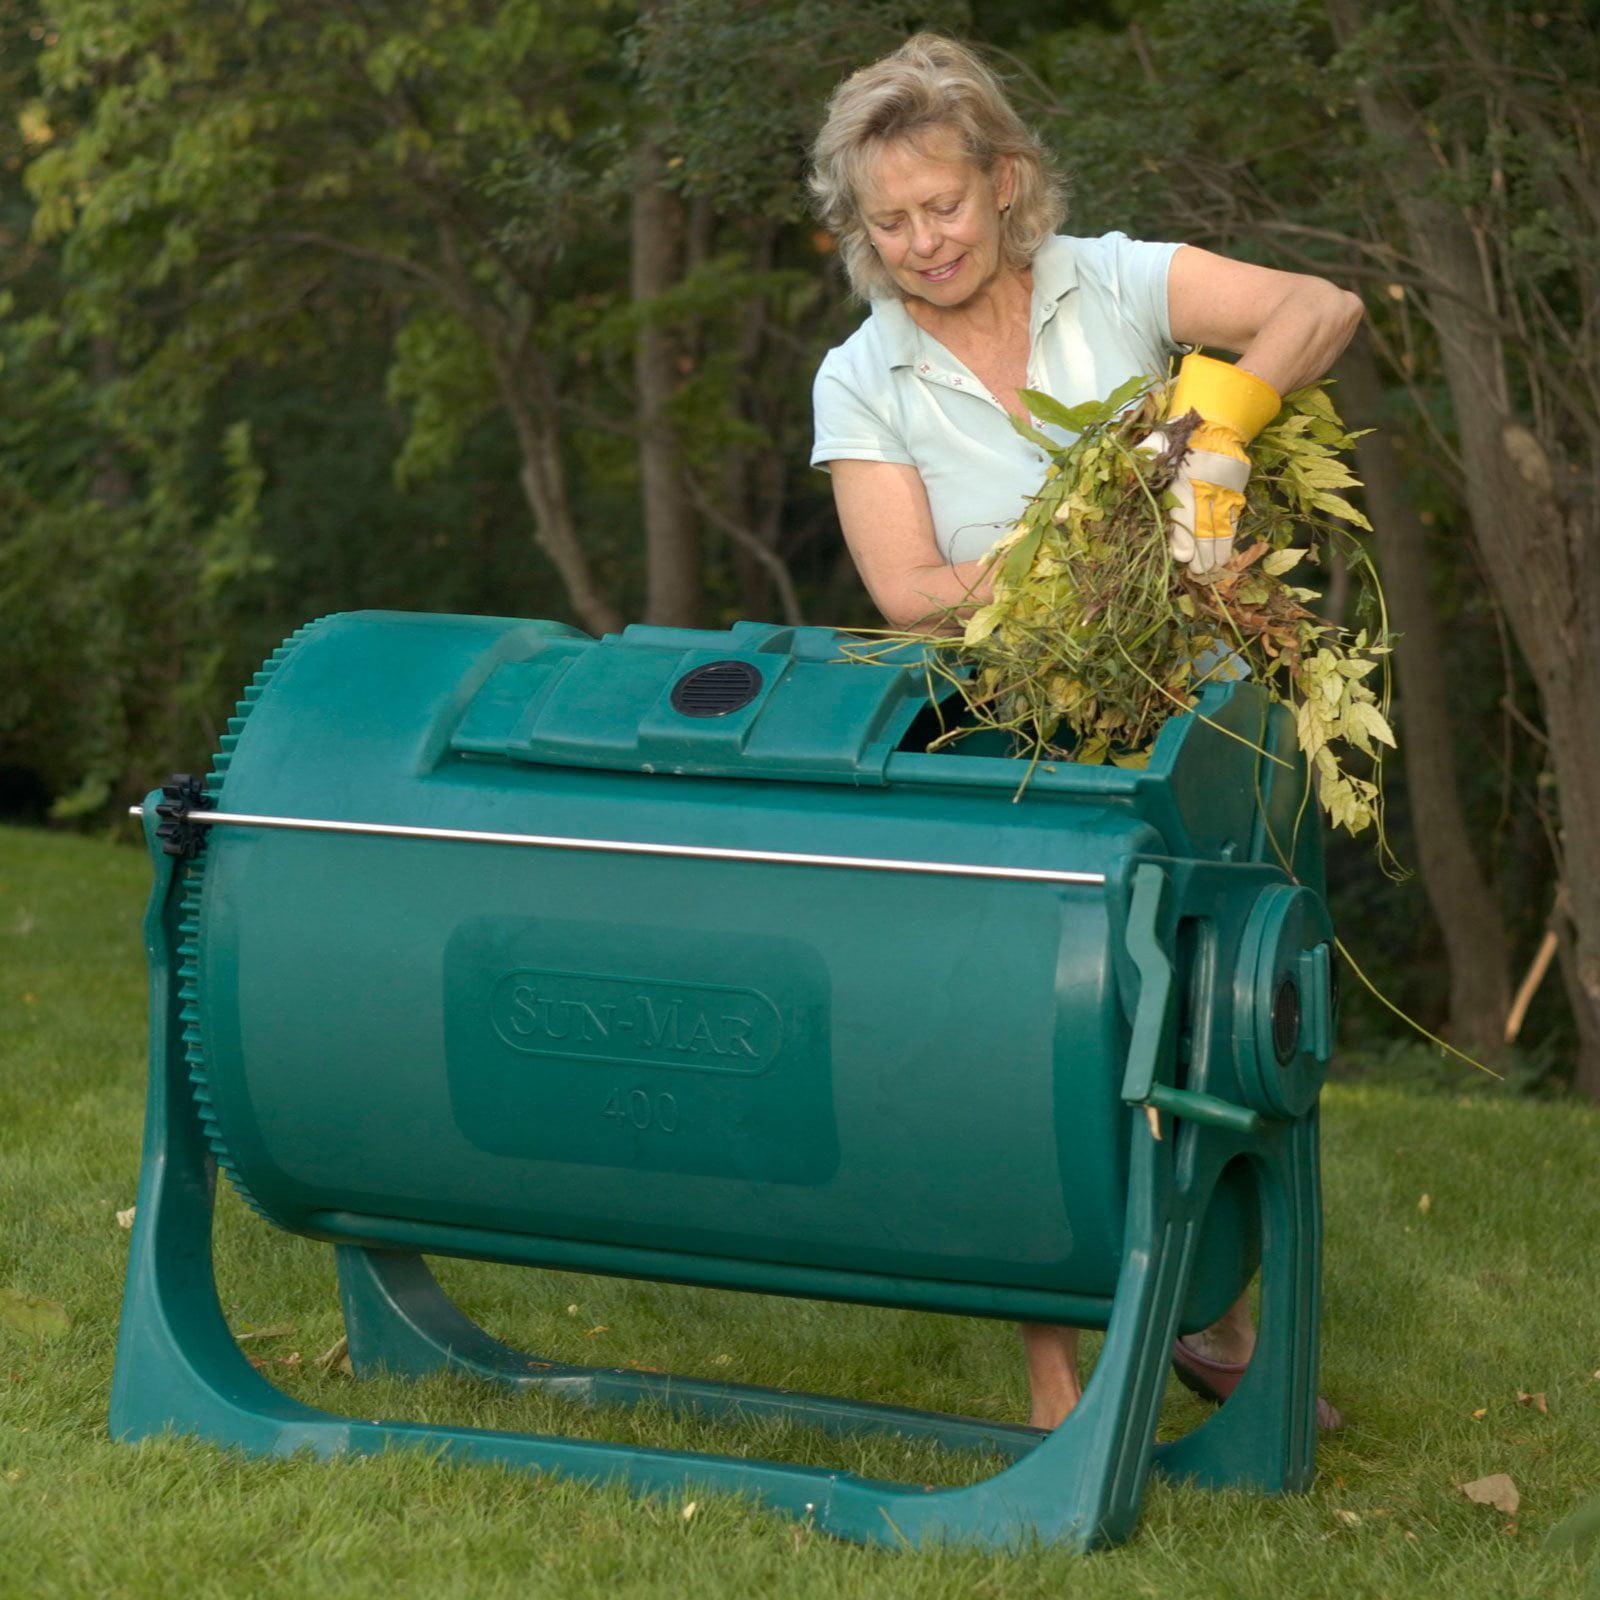 Sun-Mar 400 Autoflow 102 Gallon Compost Tumbler by Sun-Mar Corporation